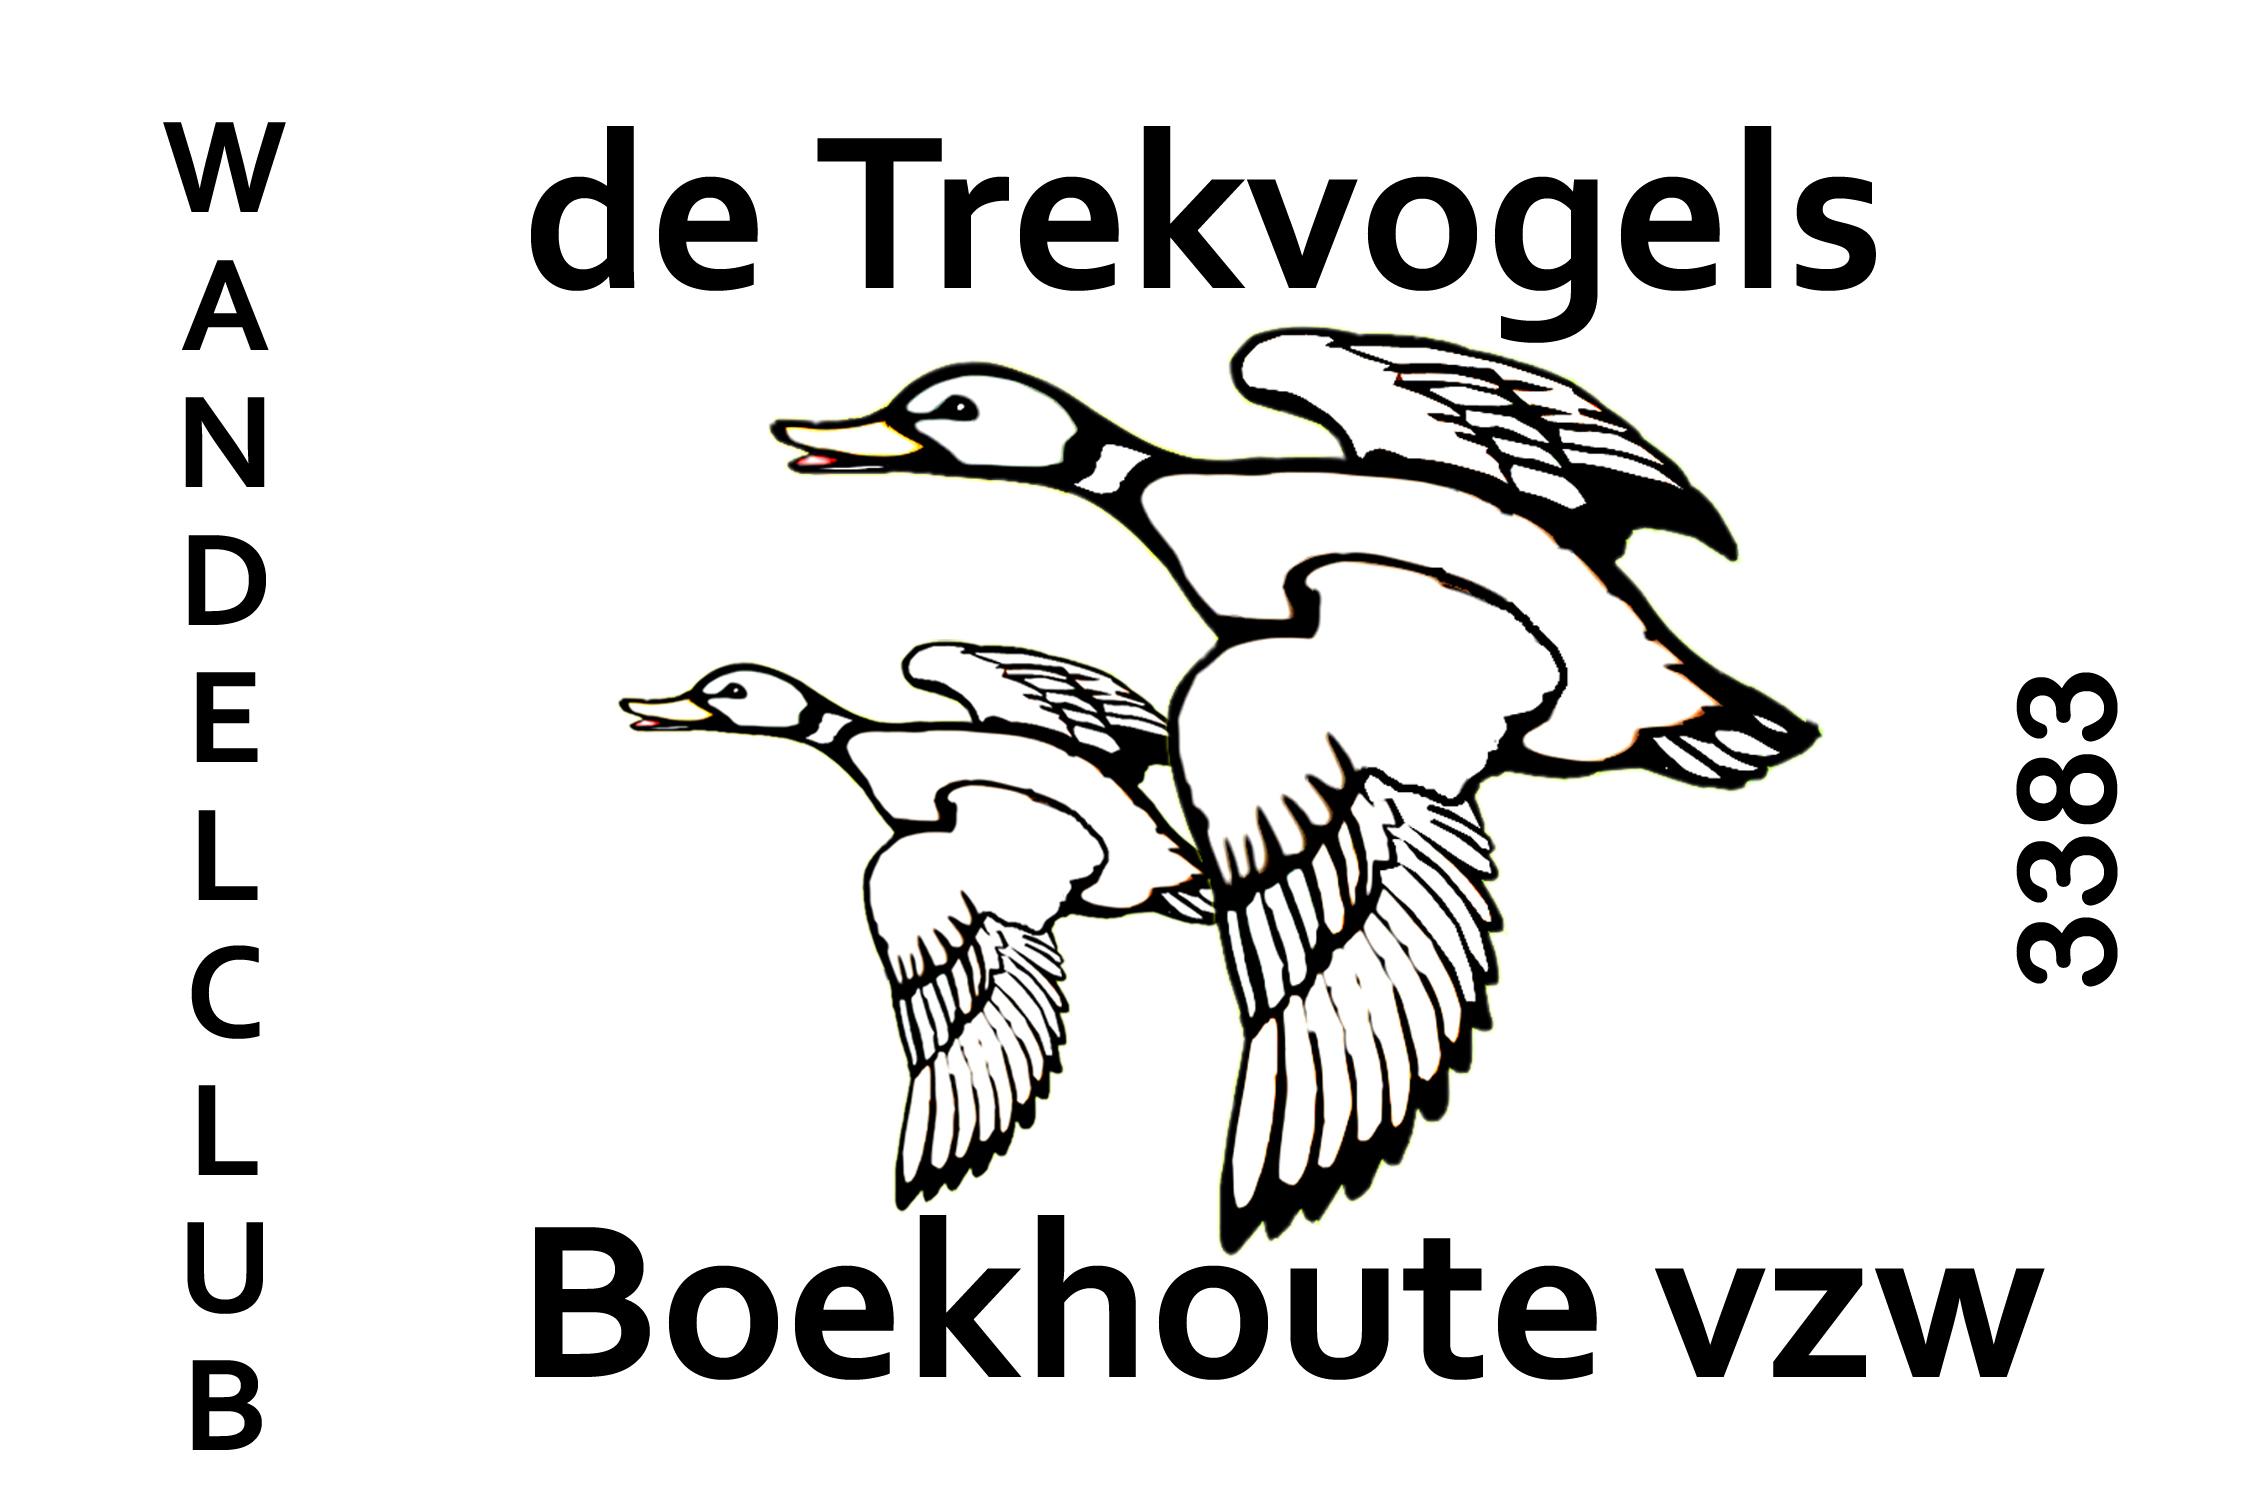 De Trekvogels Boekhoute vzw